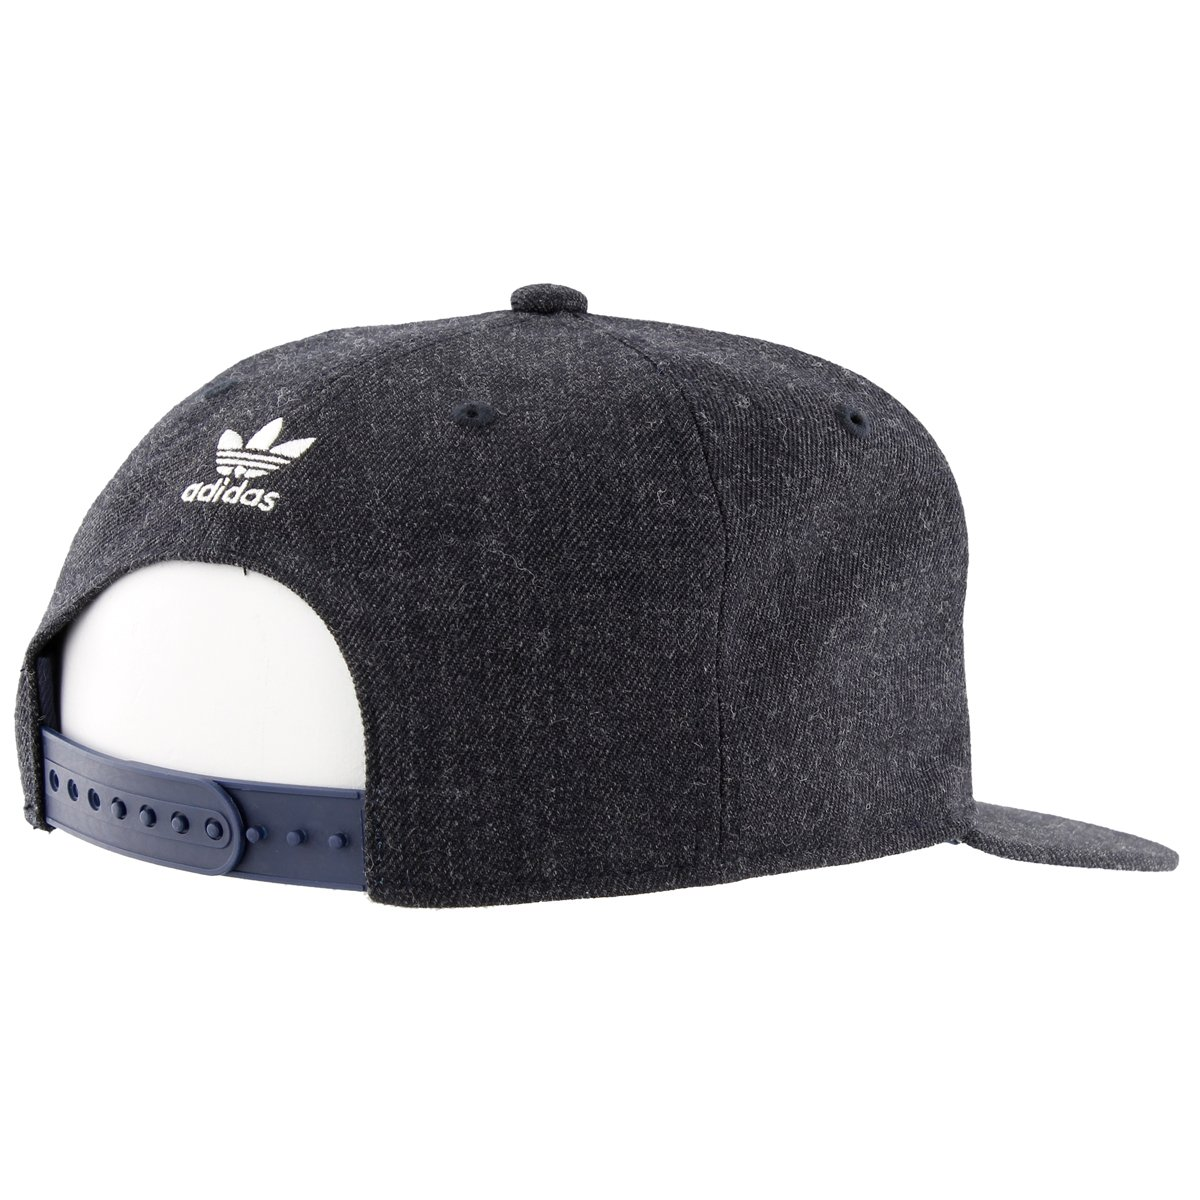 adidas Men's Originals Snapback Flatbrim Cap, Heather Navy, One Size by adidas Originals (Image #4)